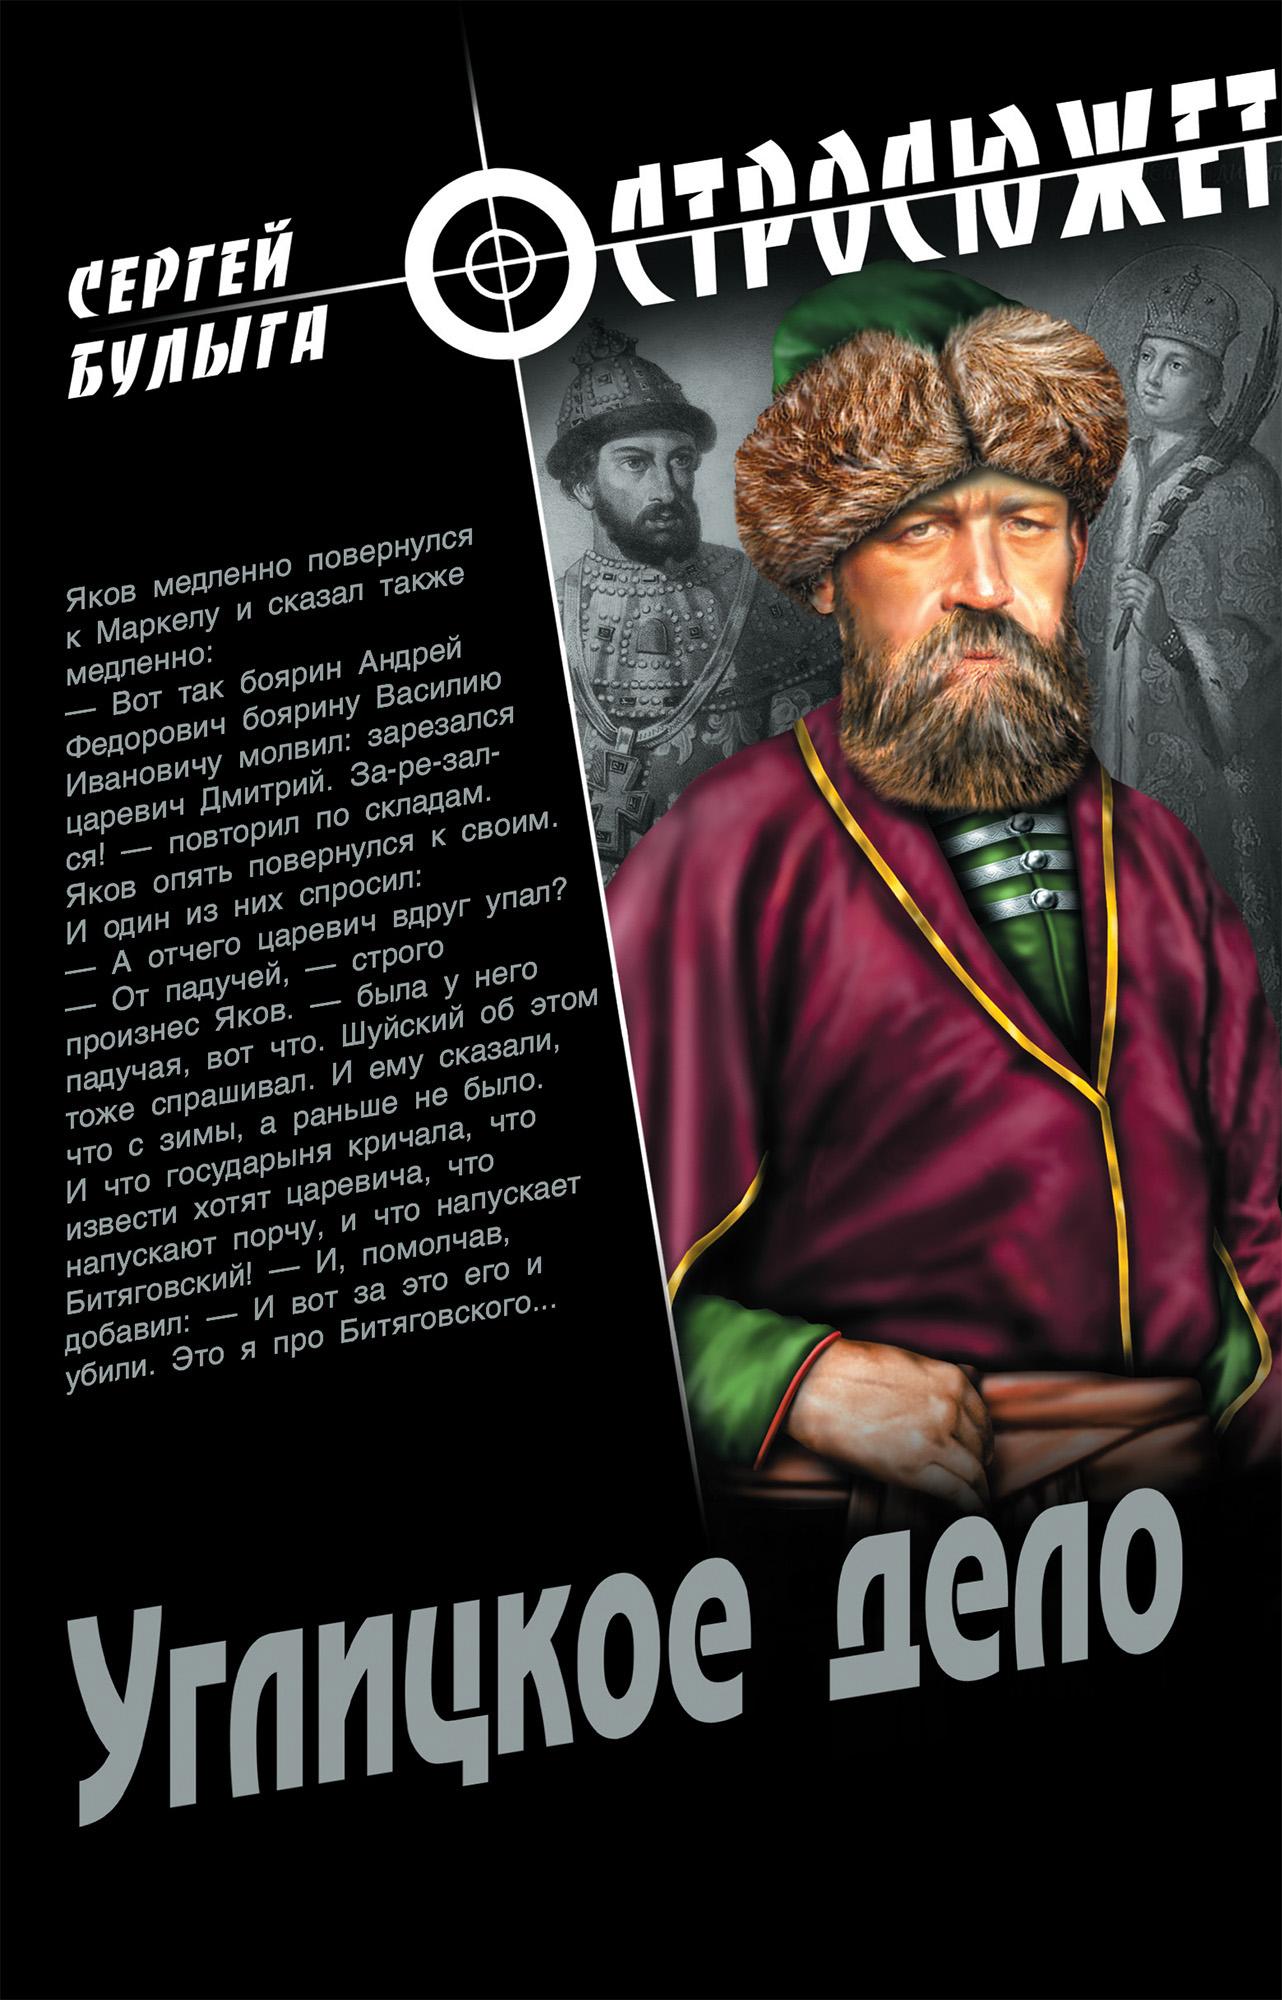 Сергей Булыга Углицкое дело